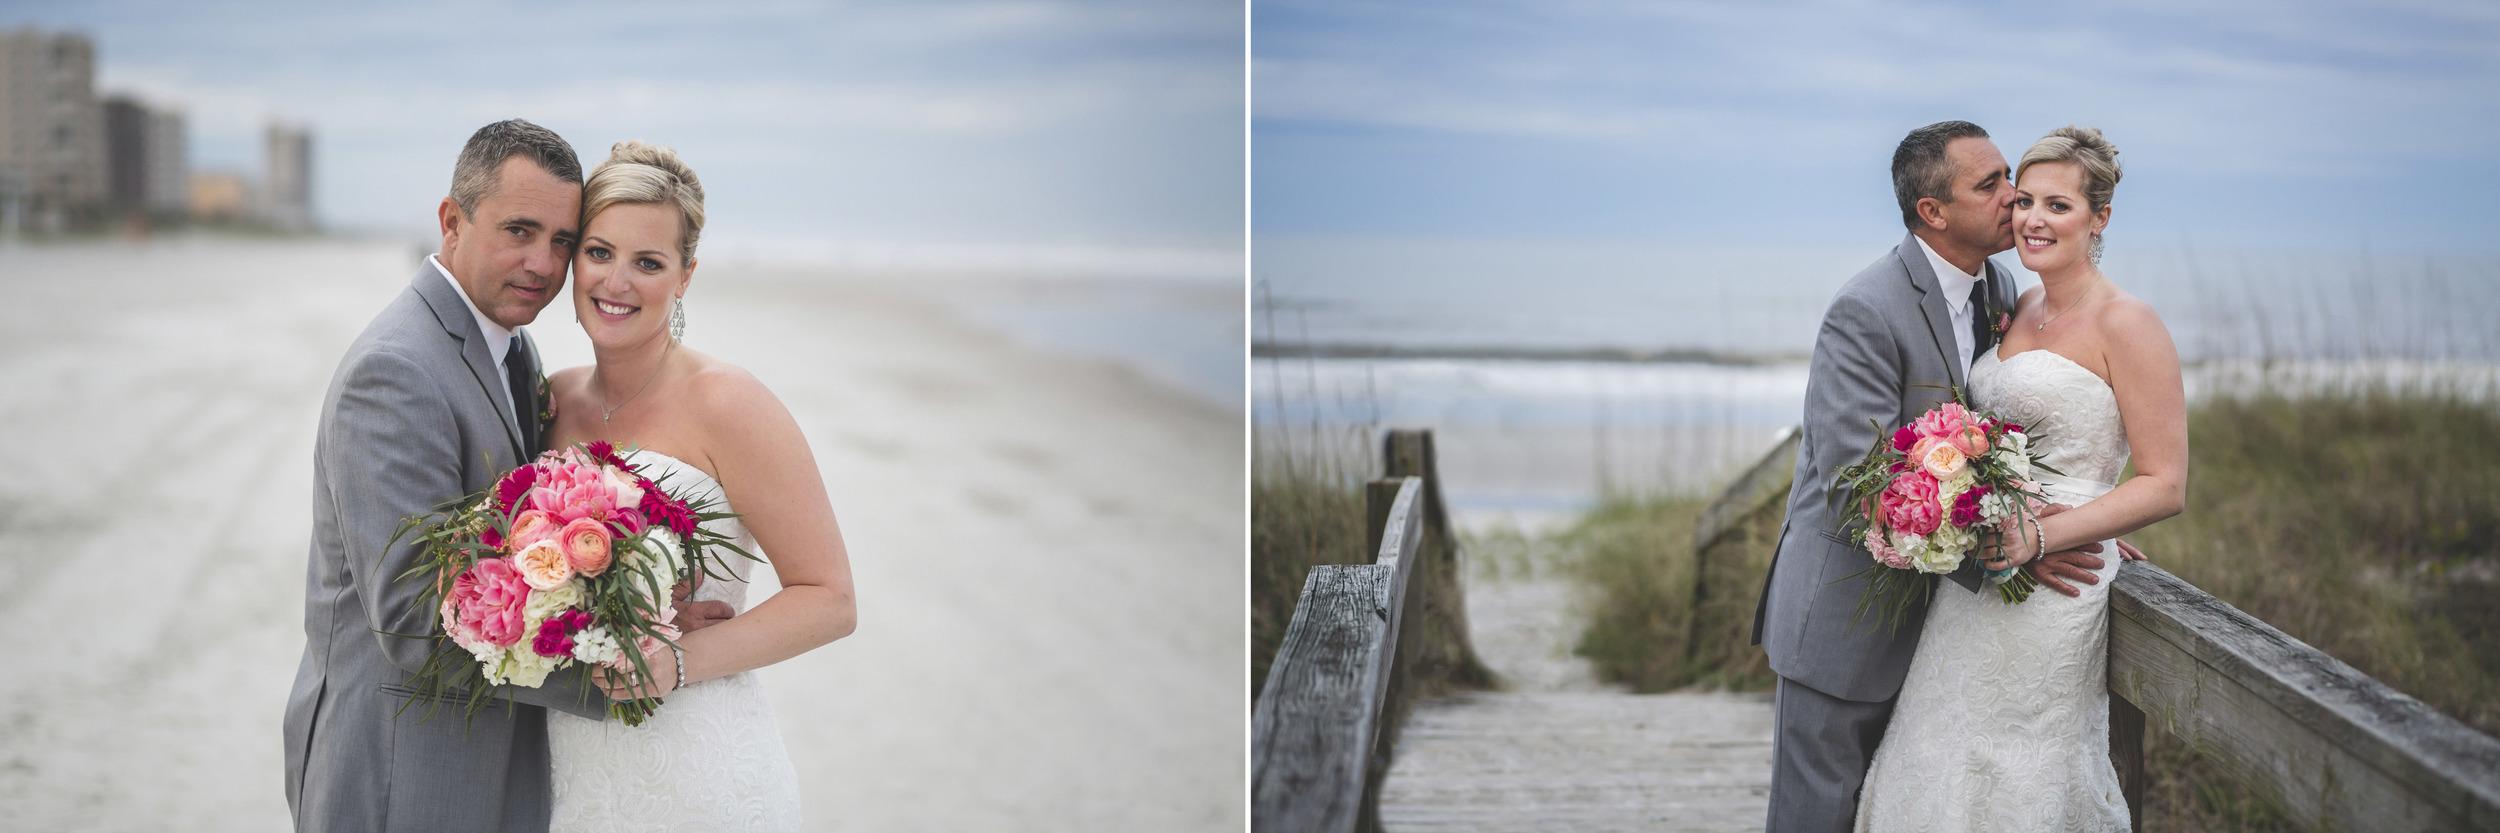 adam-szarmack-casa-marina-wedding-photographer-jacksonville-beach-florida-43.jpg